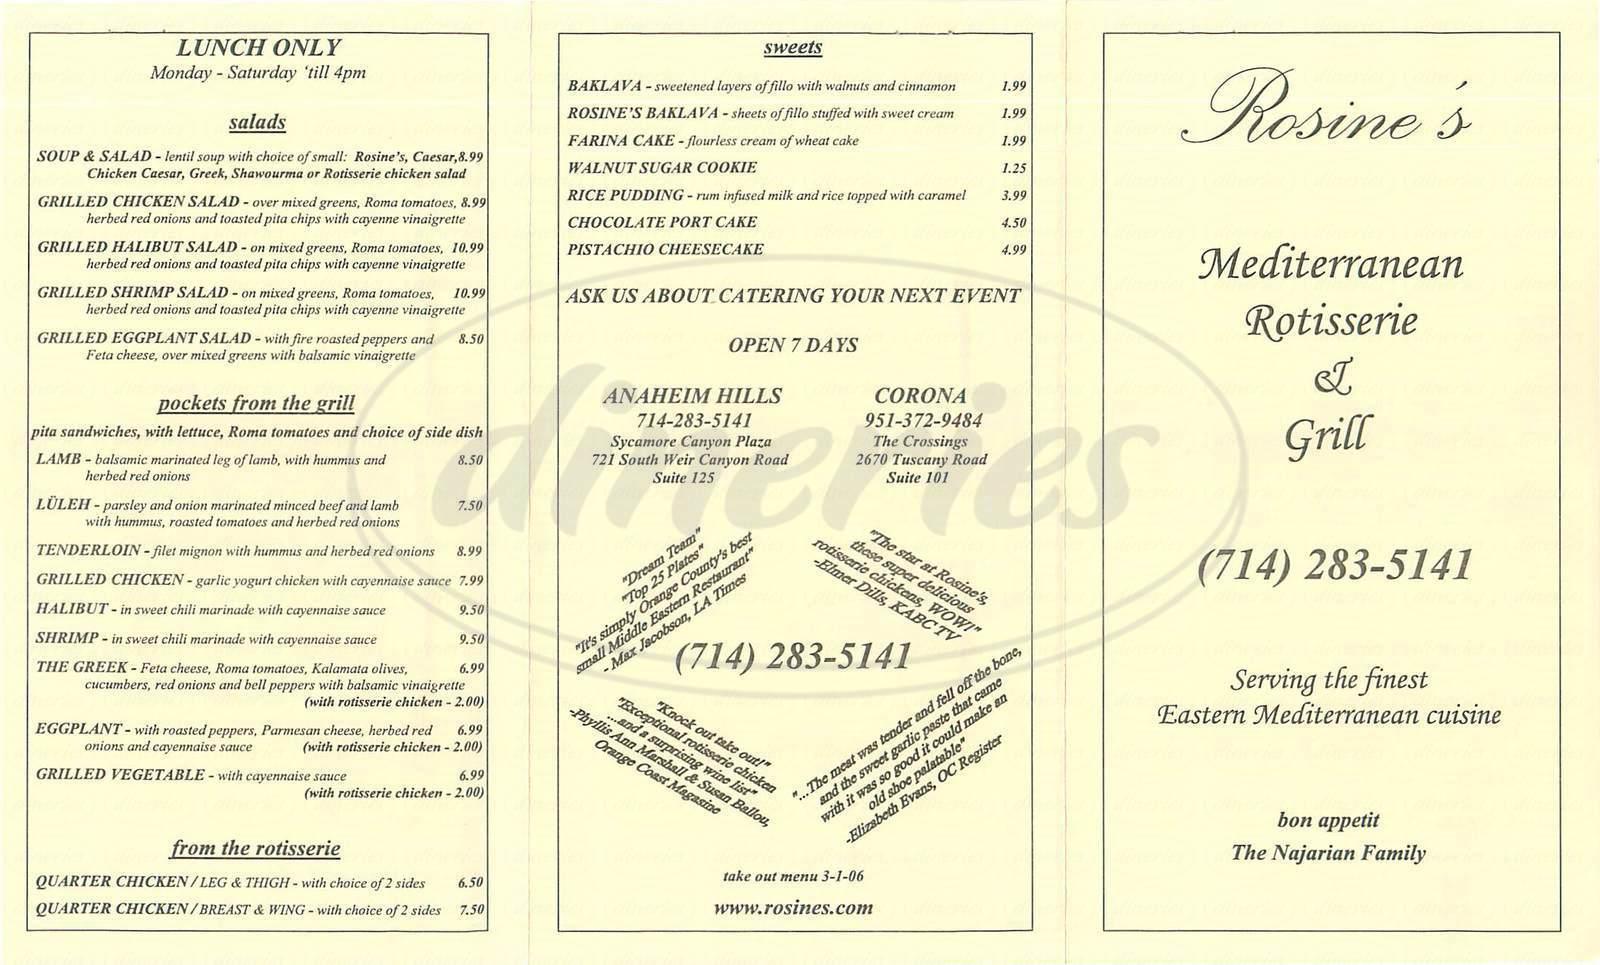 menu for Rosine's Mediterranean Rotisserie & Grill